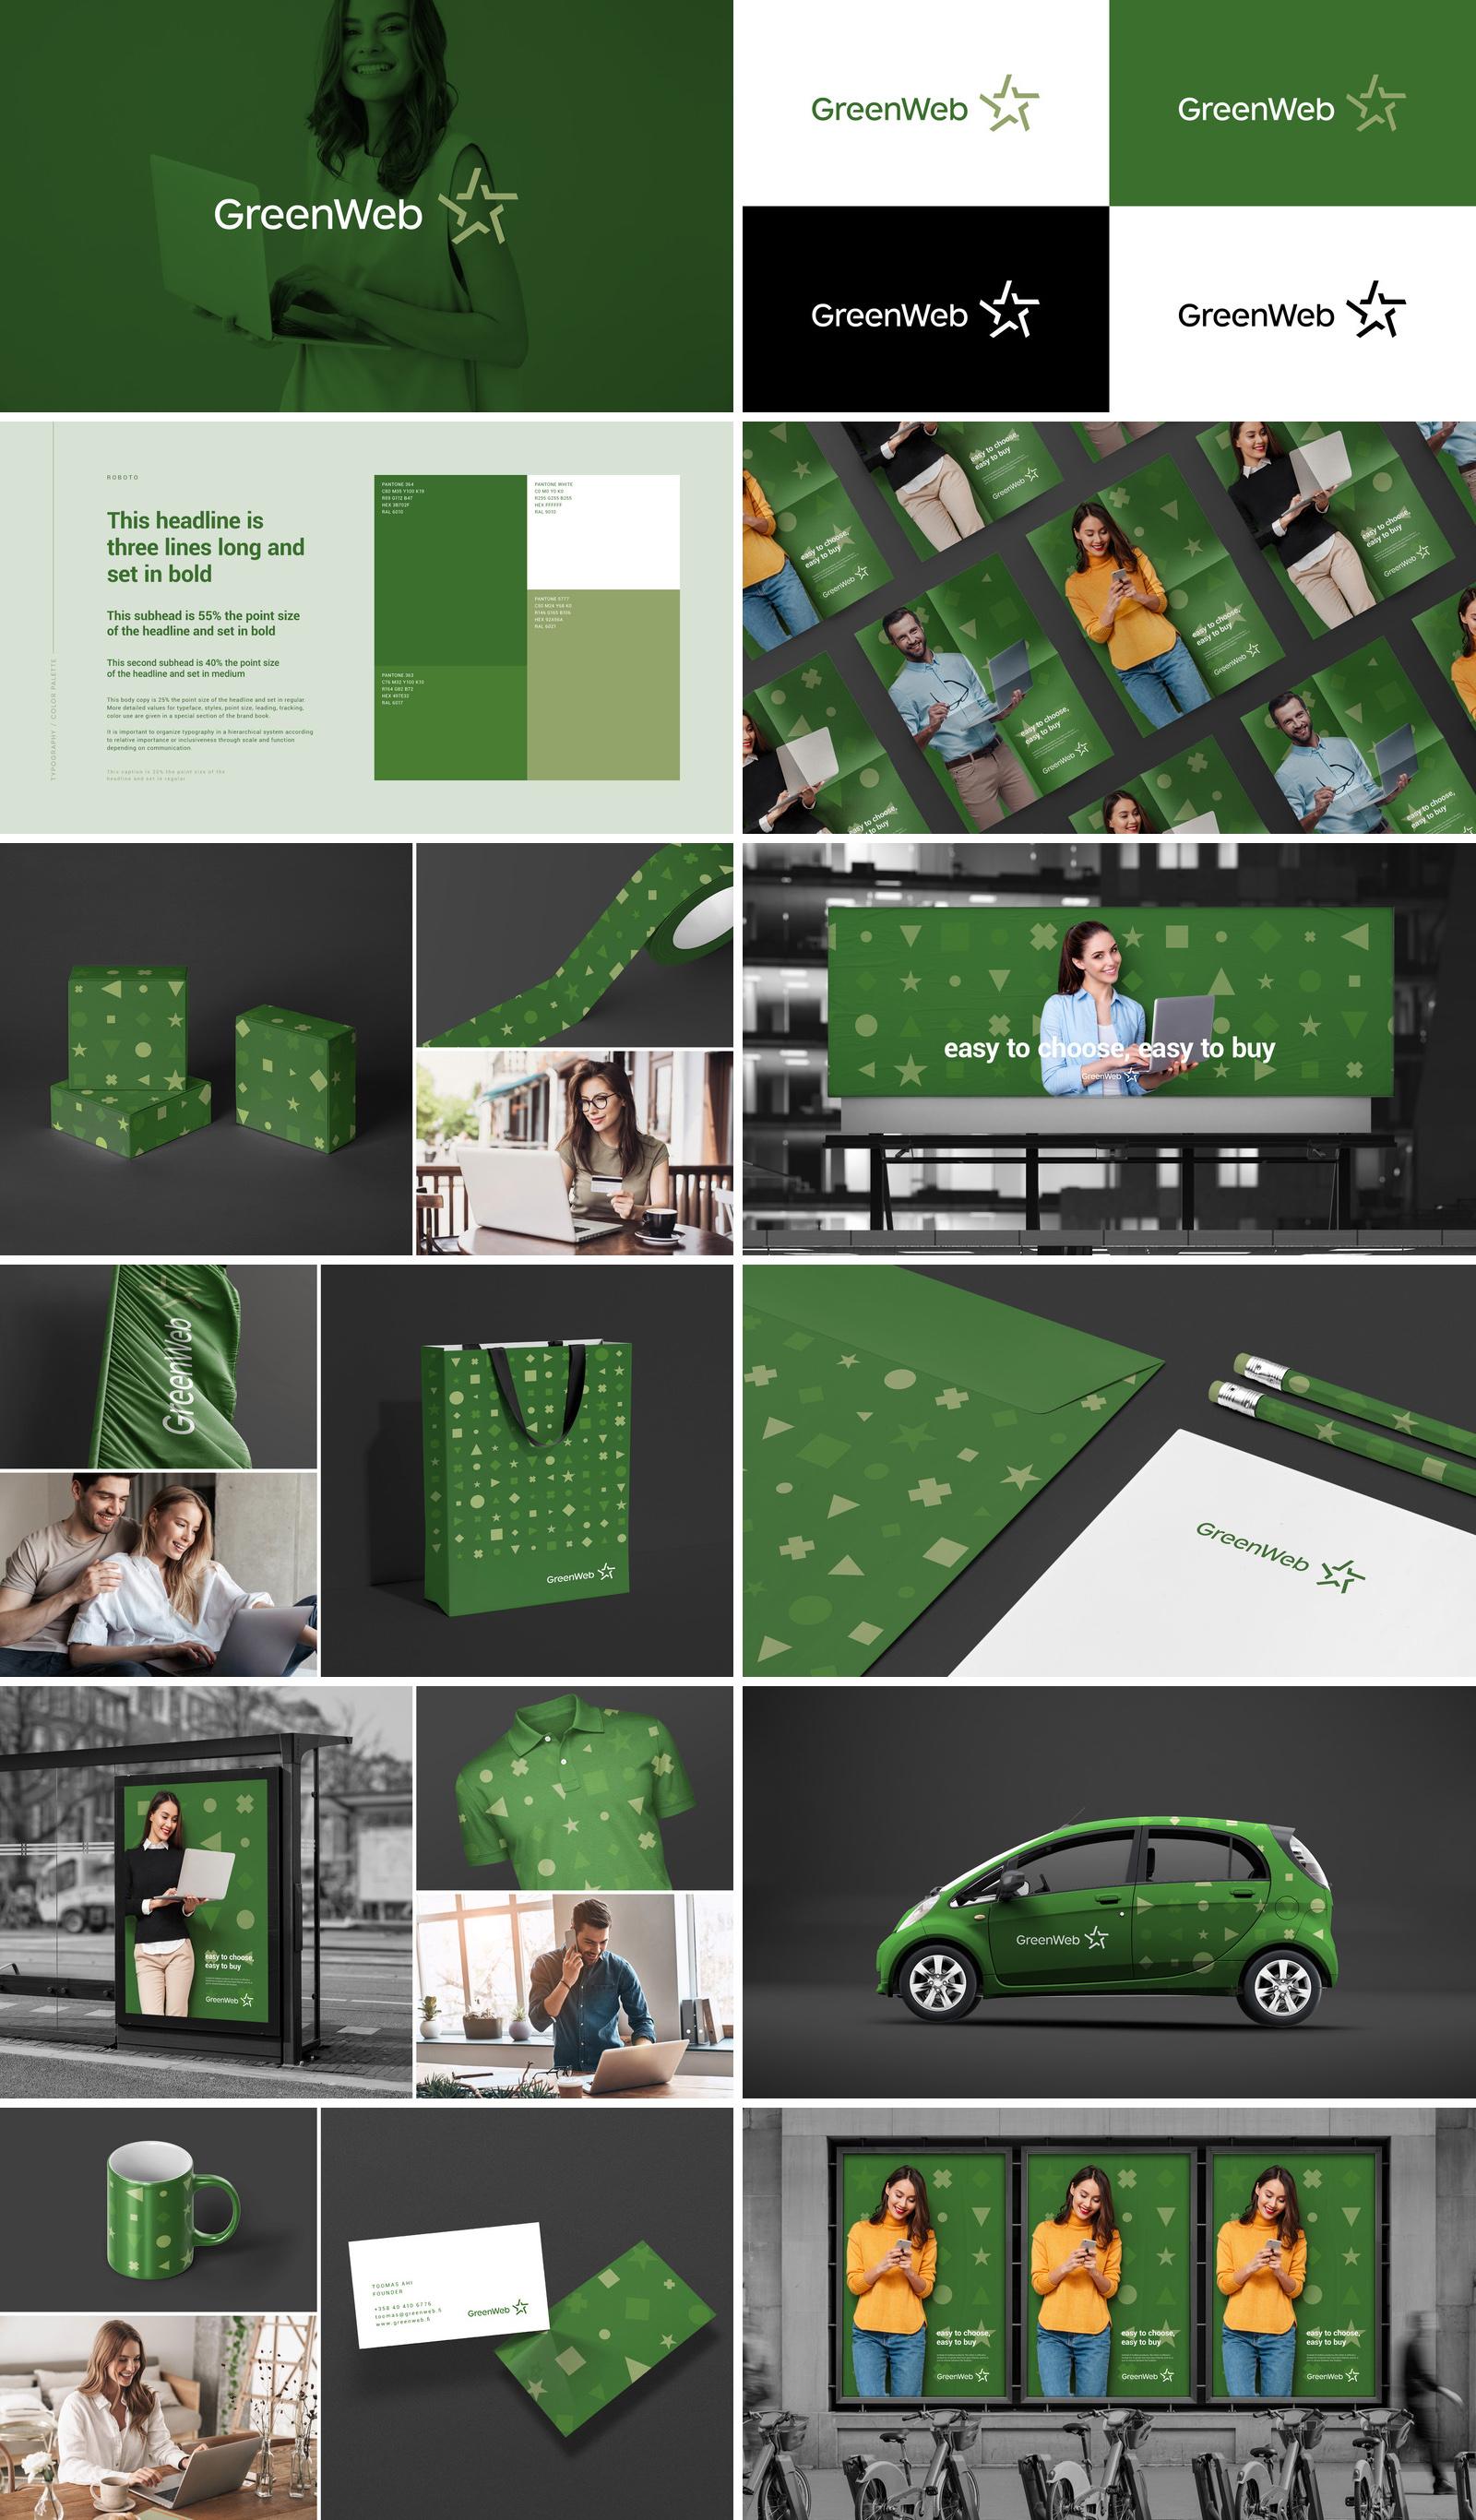 GreenWeb / Разработка визуальной идентичности